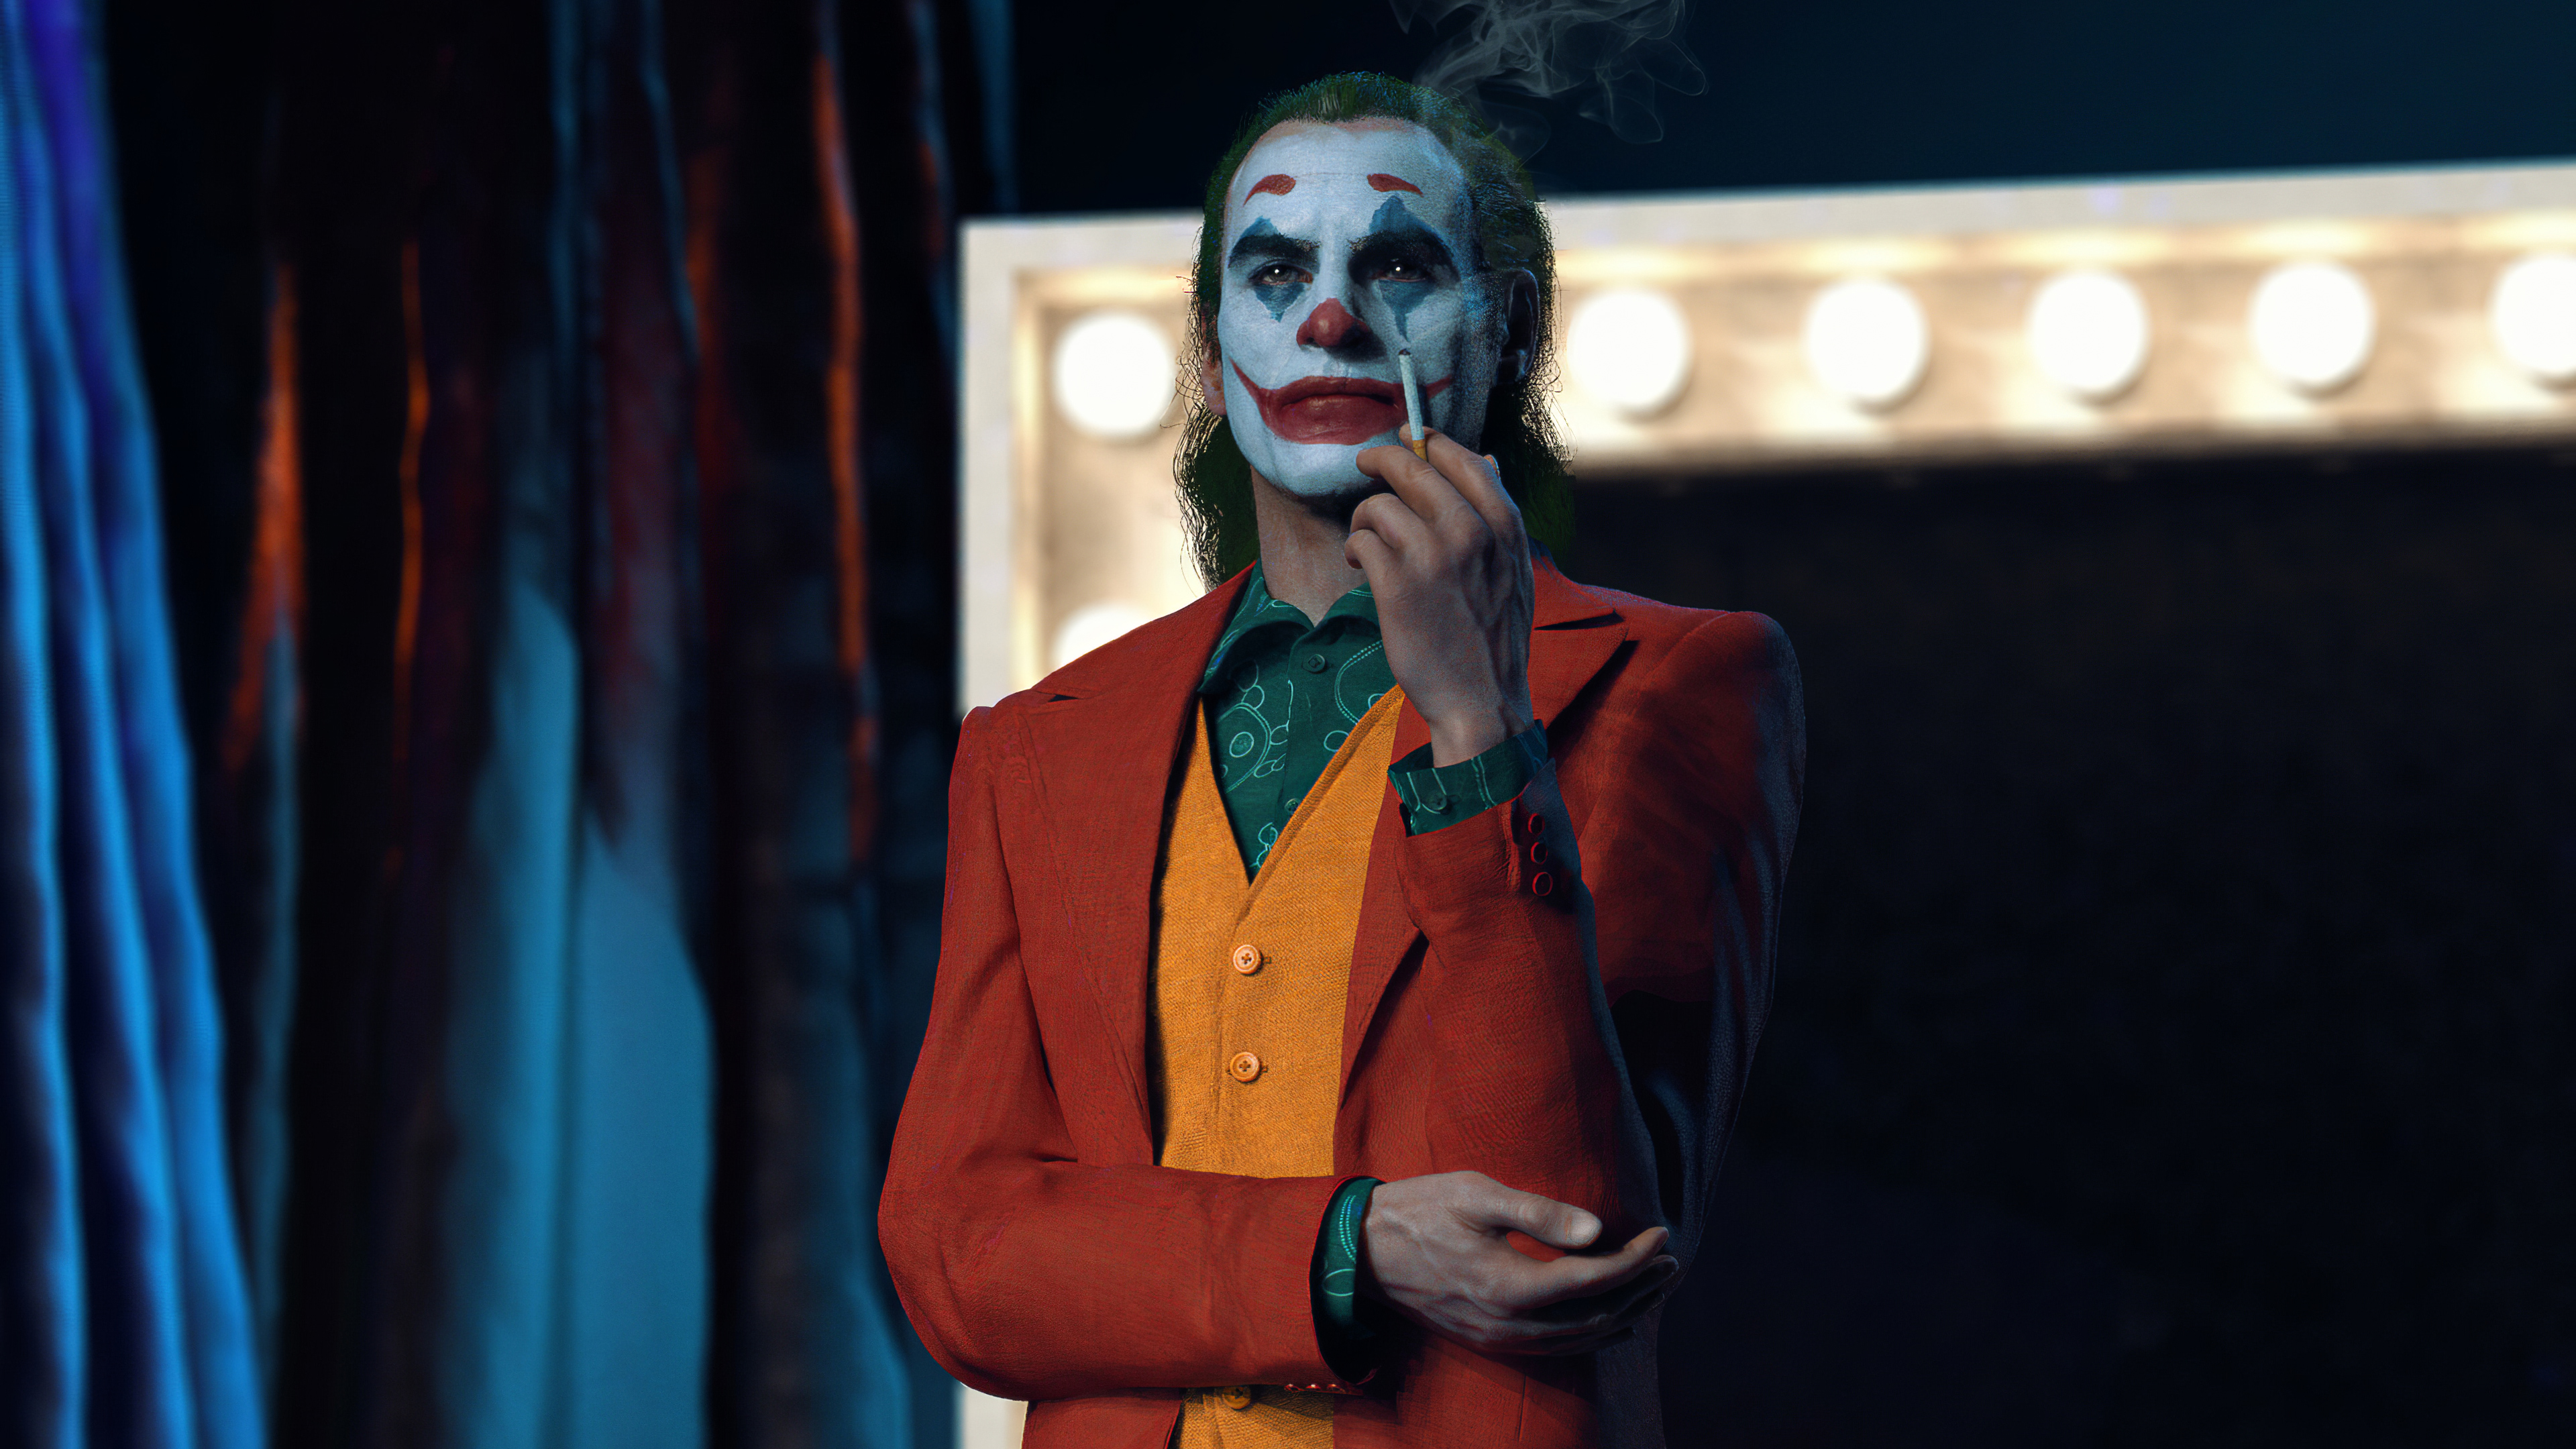 joaquin joker art 1576582653 - Joaquin Joker art - Joker wallpaper 4k hd, joker phone wallpaper hd 4k, joker hd wallpaper 4k, joker art wallpaper hd 4k, 4k wallpaper joker